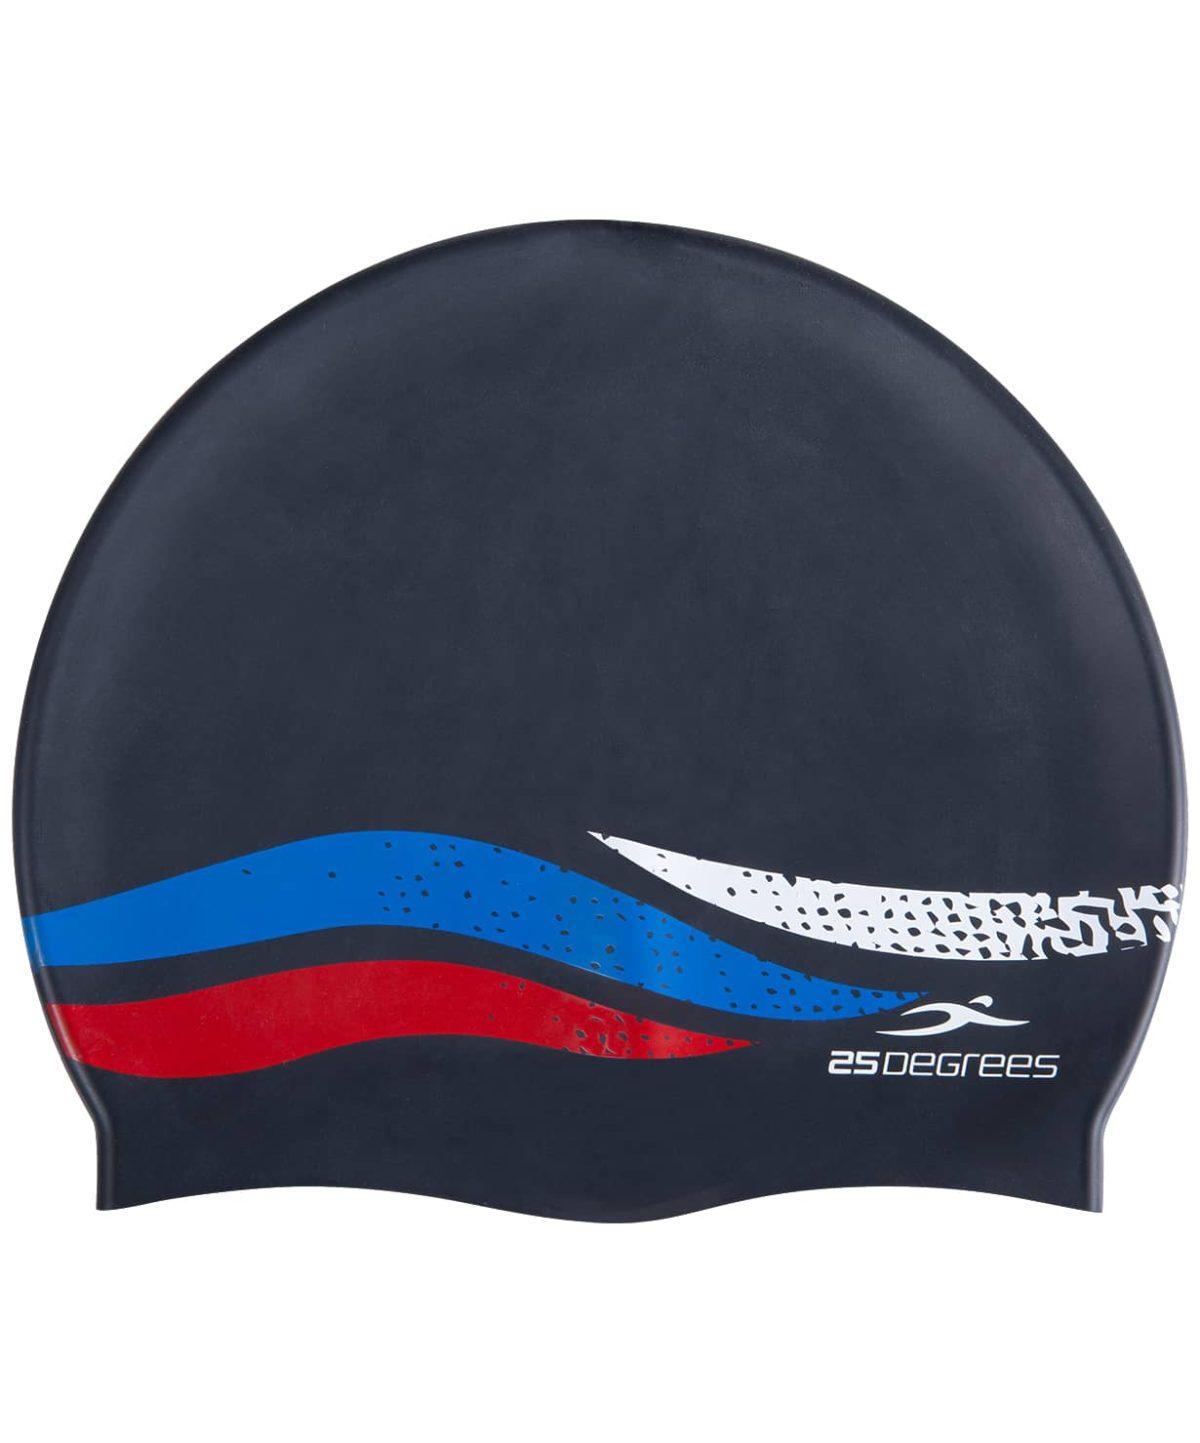 25DEGREES Шапочка для плавания Russia JR, подростк. силикон  25D21005J: чёрный - 2